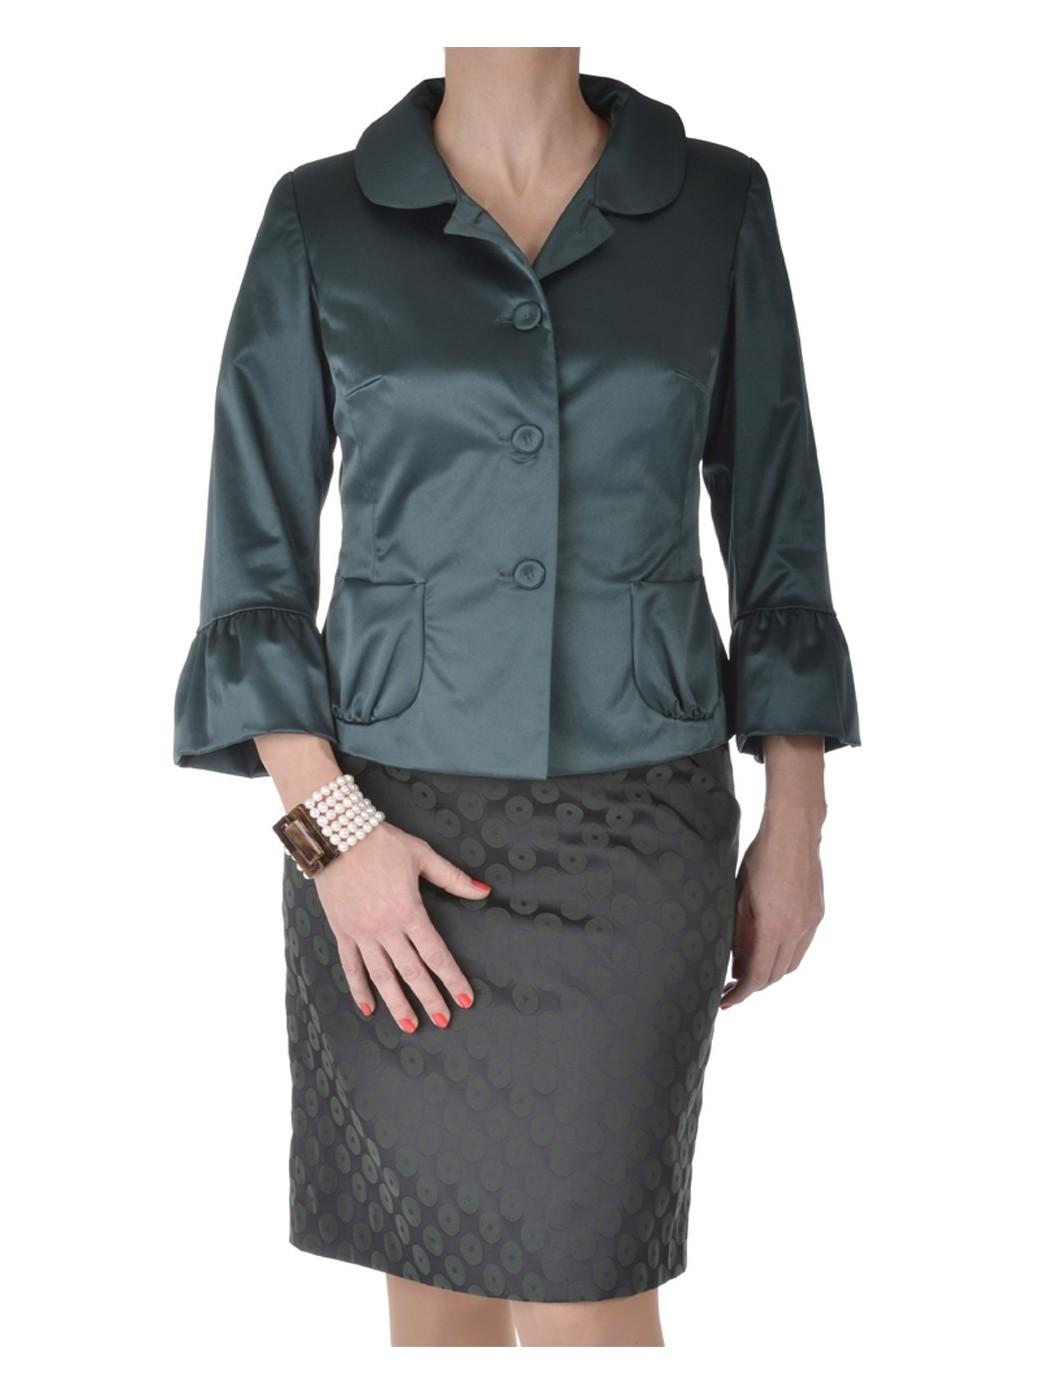 Green satin dress and blazer